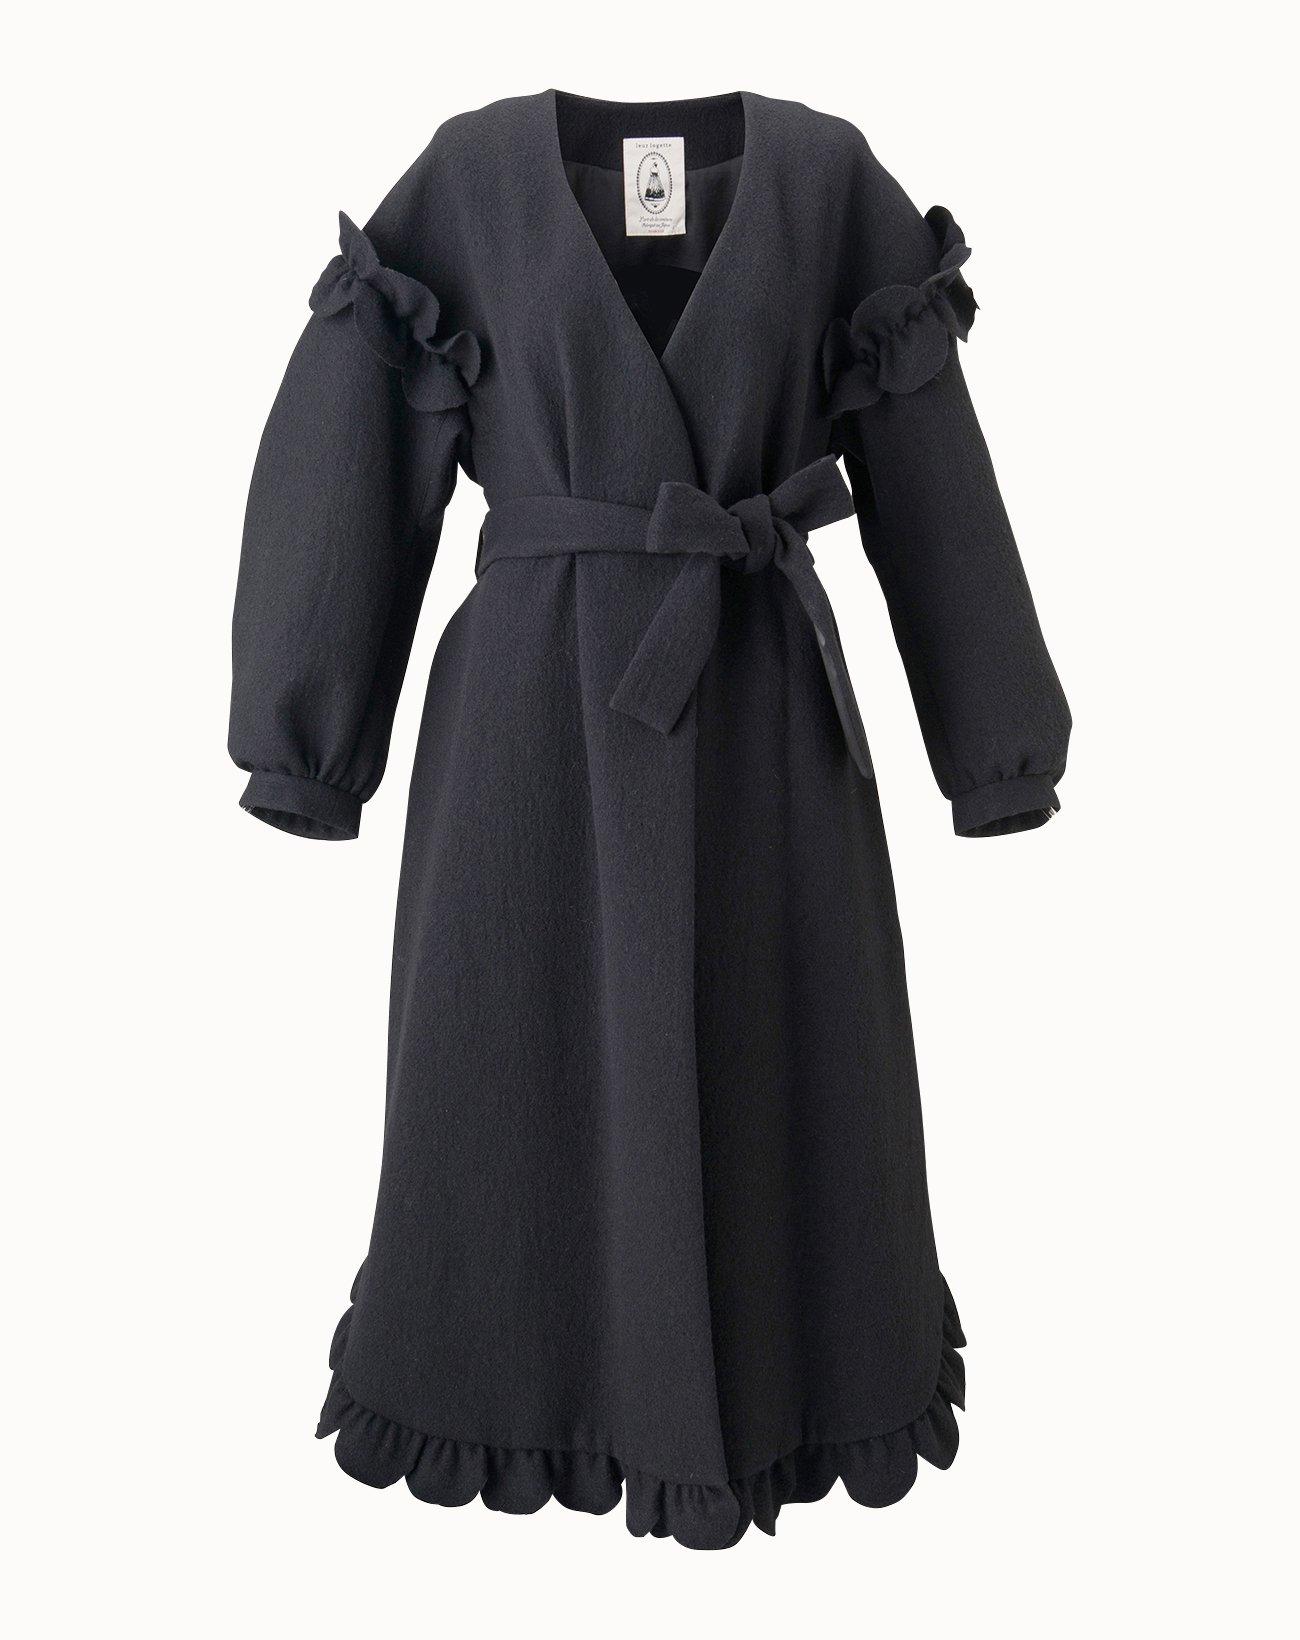 Wool Soft Melton Coat - Black